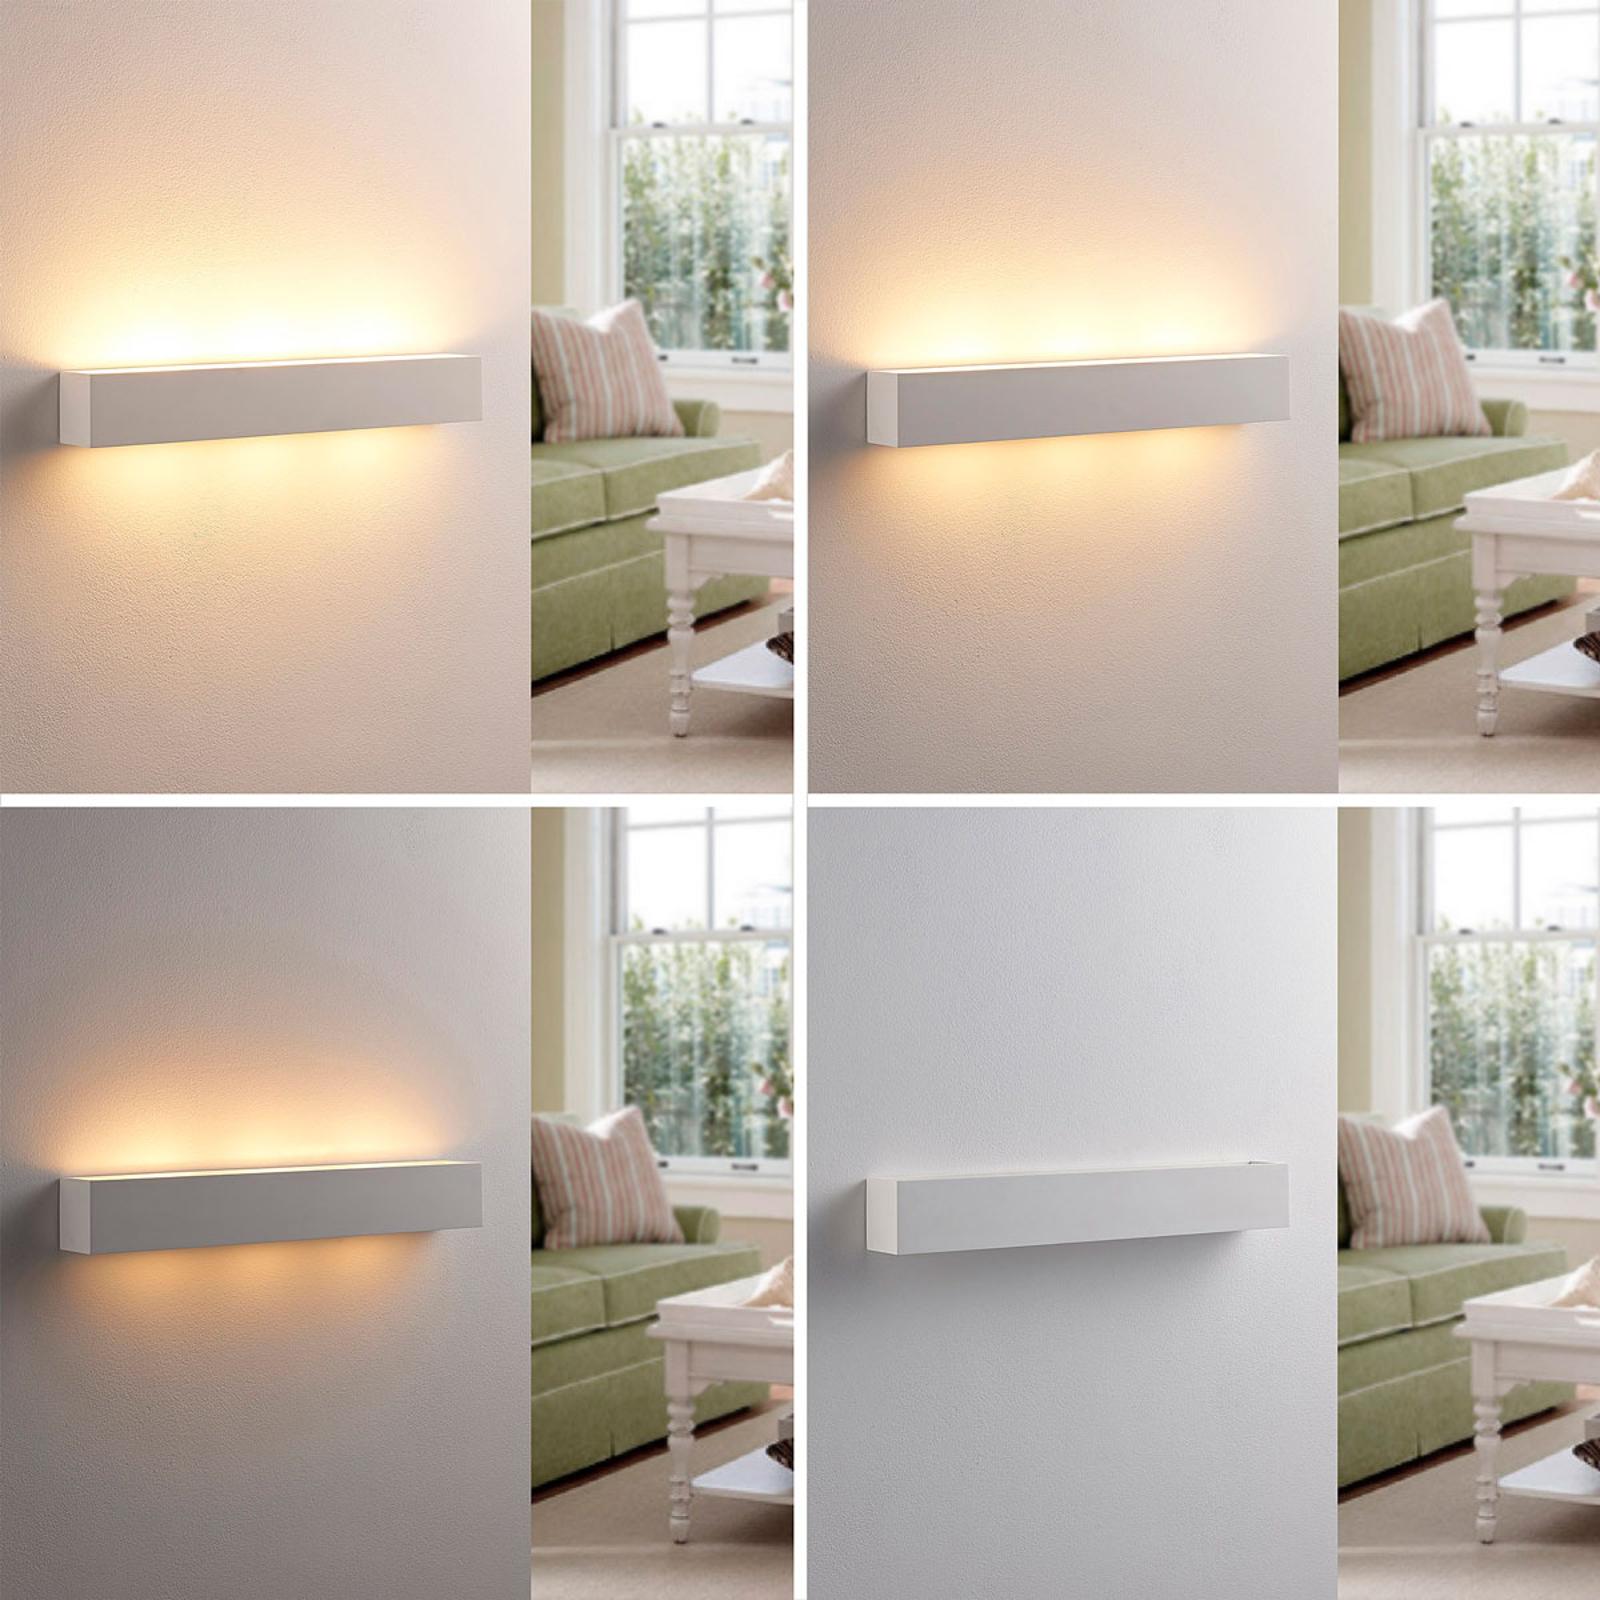 Tjada - langwerpige LED wandlamp van gips